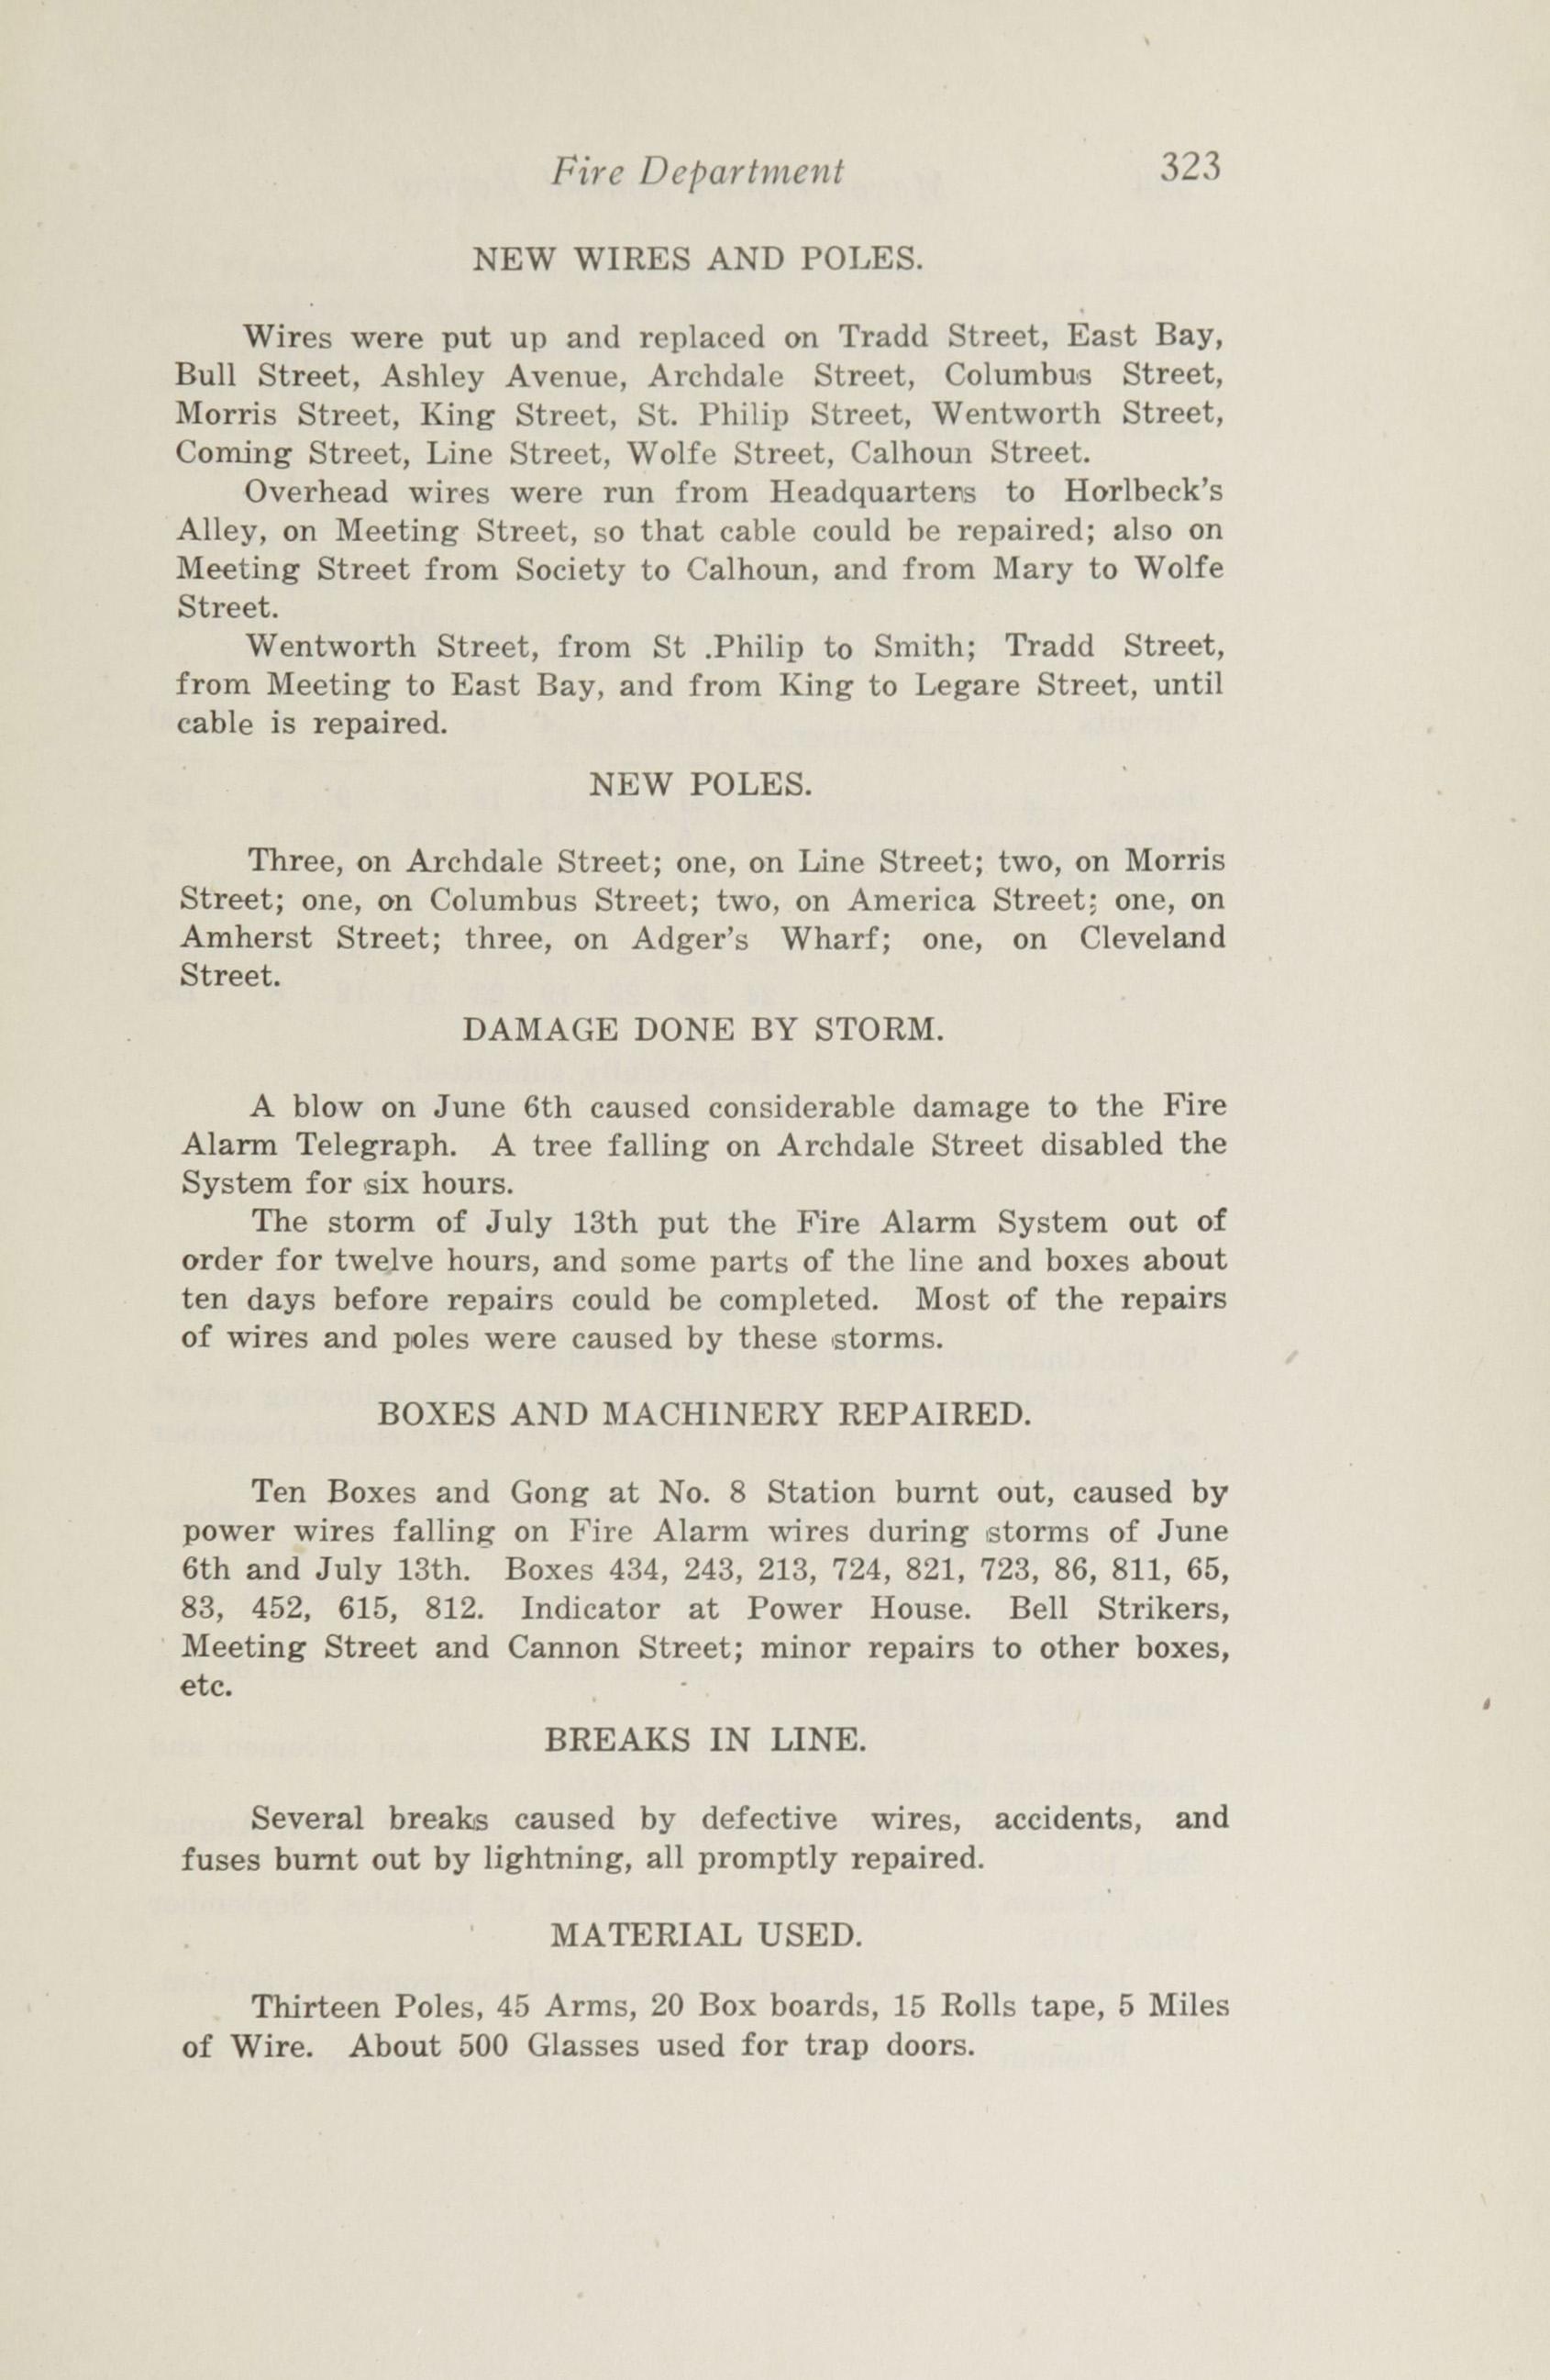 Charleston Yearbook, 1916, page 323